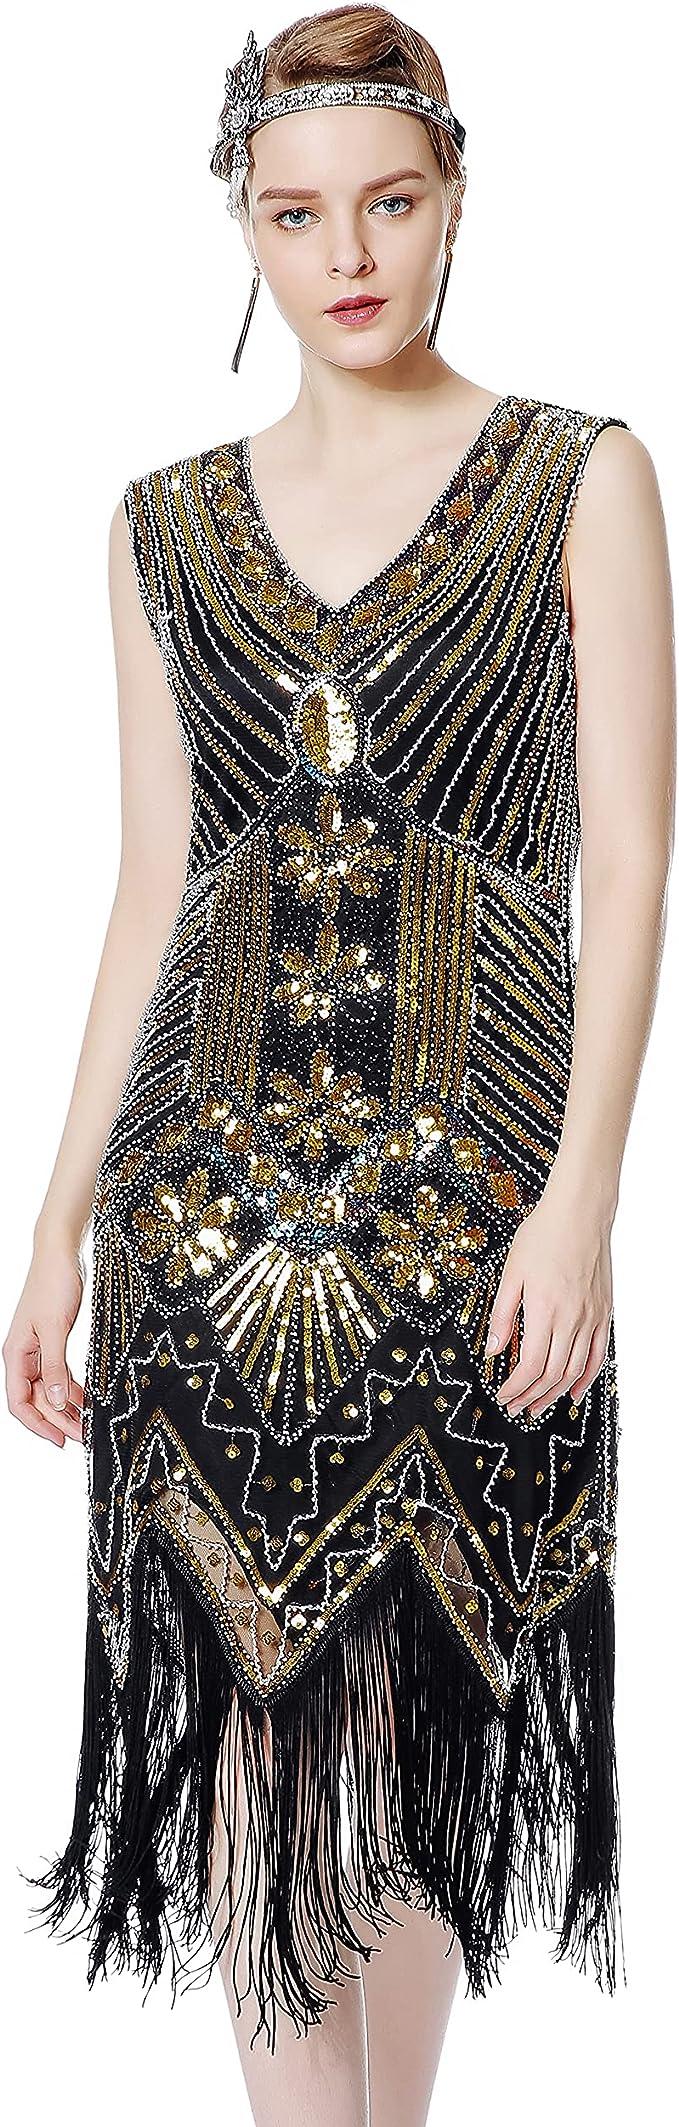 1920s Style Dresses, 20s Dresses Metme Womens Flapper Dress 1920s V Neck Beaded Fringed Gatsby Theme Roaring 20s Dress for Prom  AT vintagedancer.com